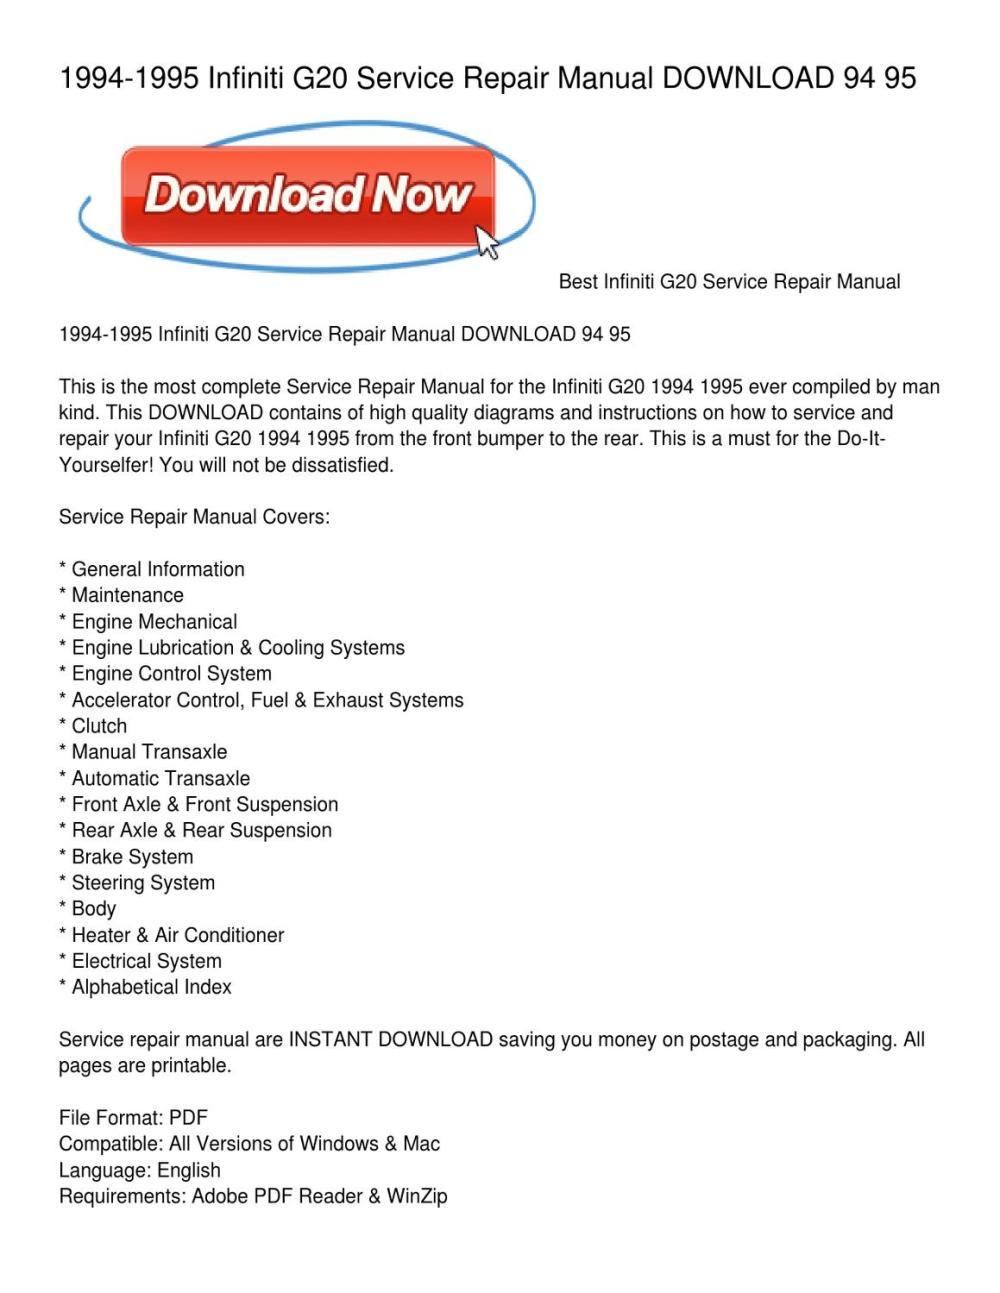 medium resolution of 1994 1995 infiniti g20 service repair manual download 94 95 by rh 1994 geo metro engine